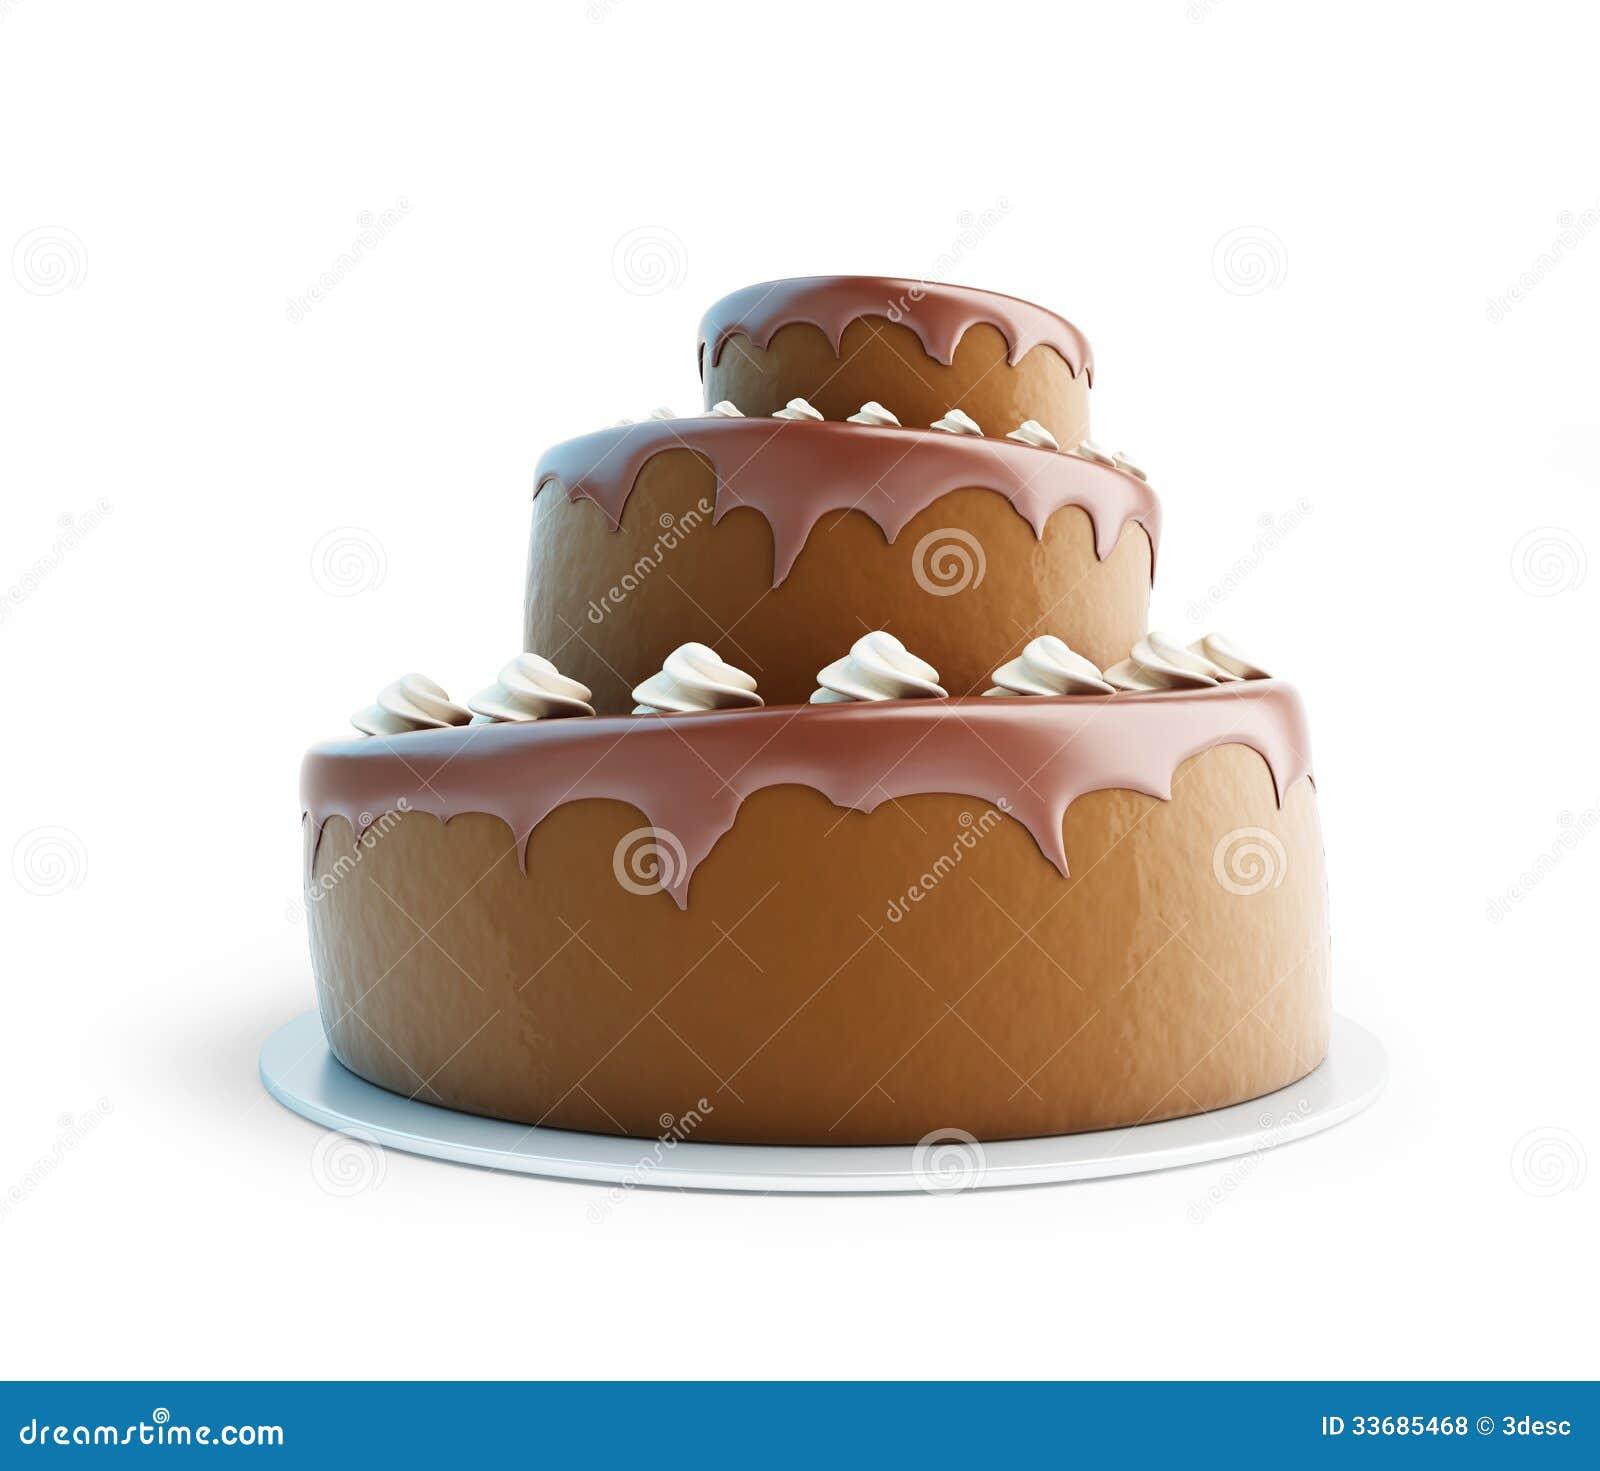 Chocolate cake 3d stock illustration. Image of close ...